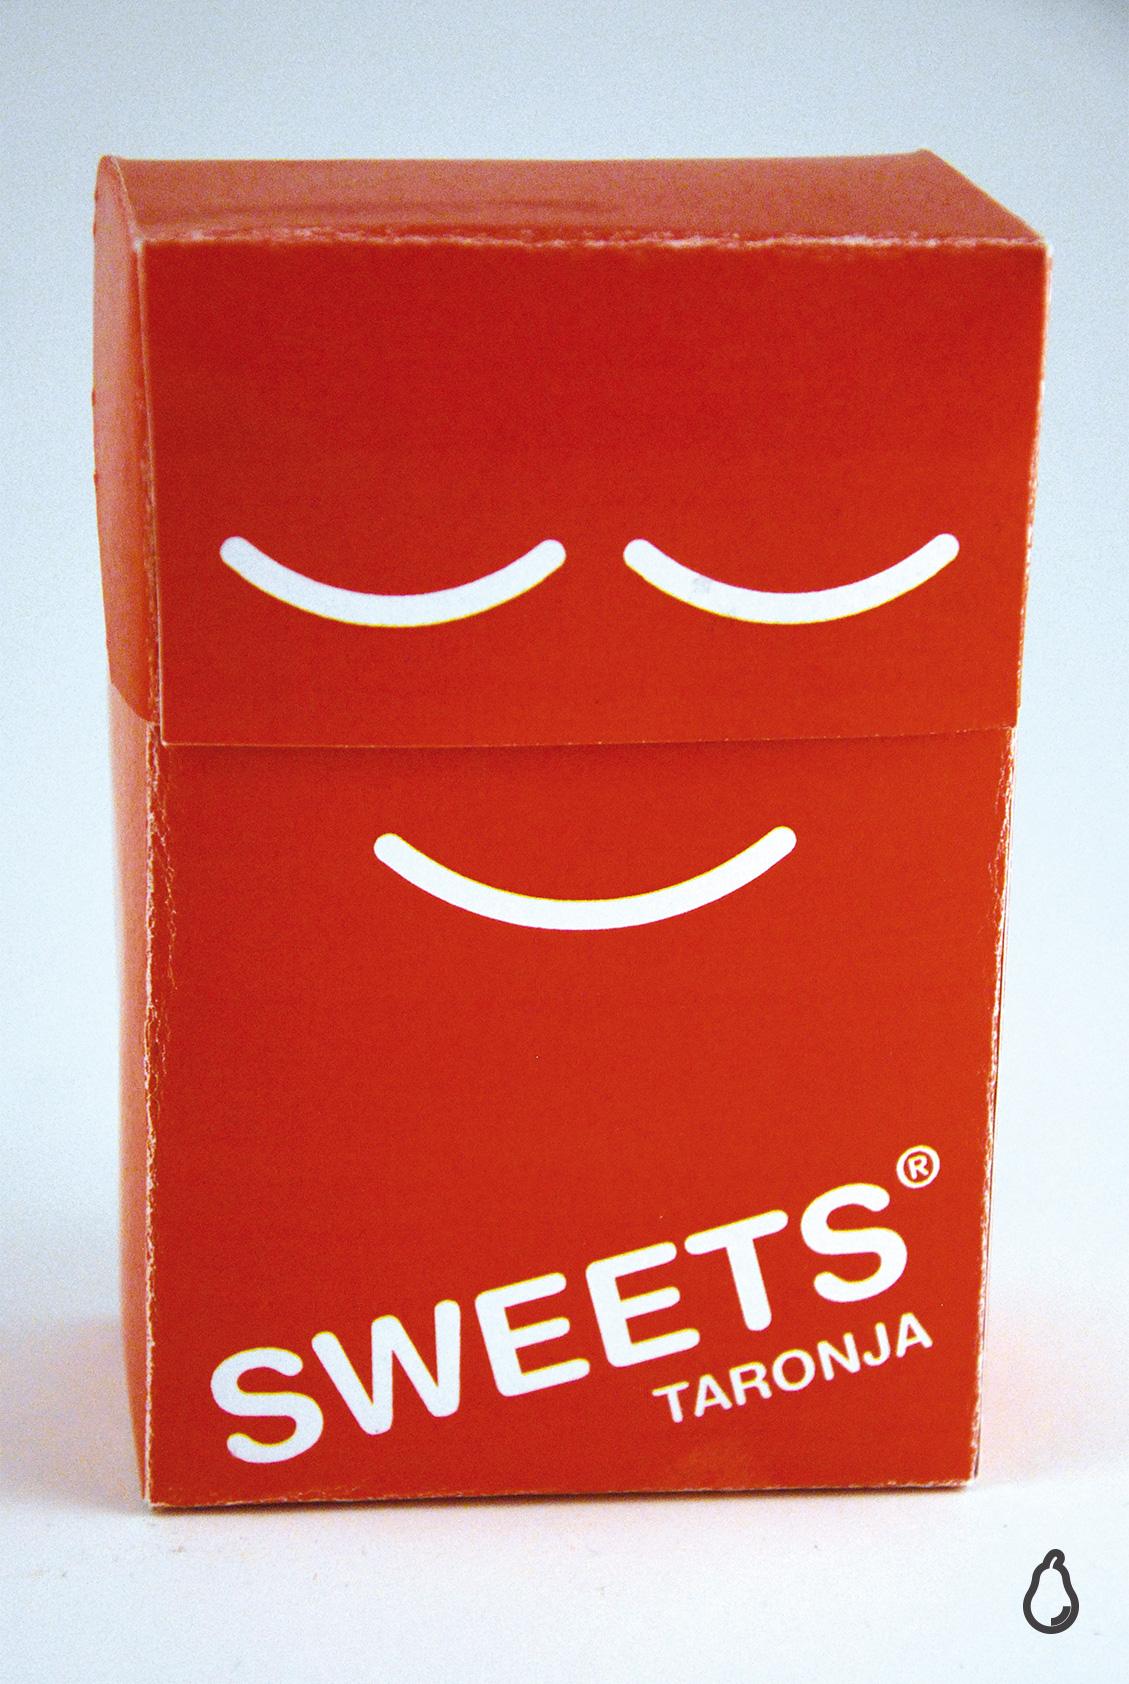 Sweets---taronja